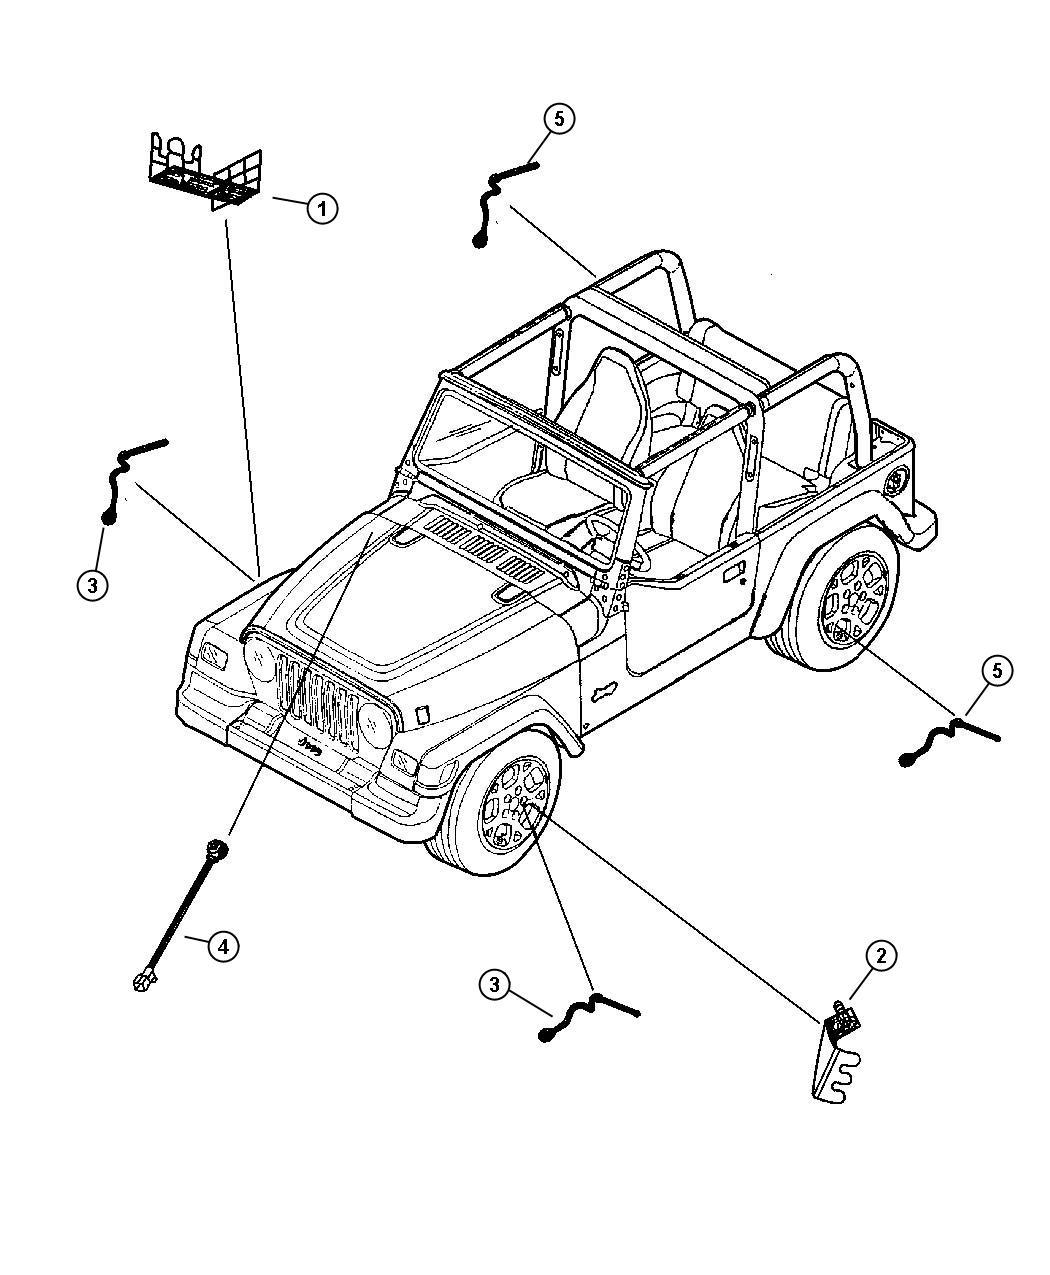 Jeep Wrangler Bracket. Abs sensor. Mounting. To left rear